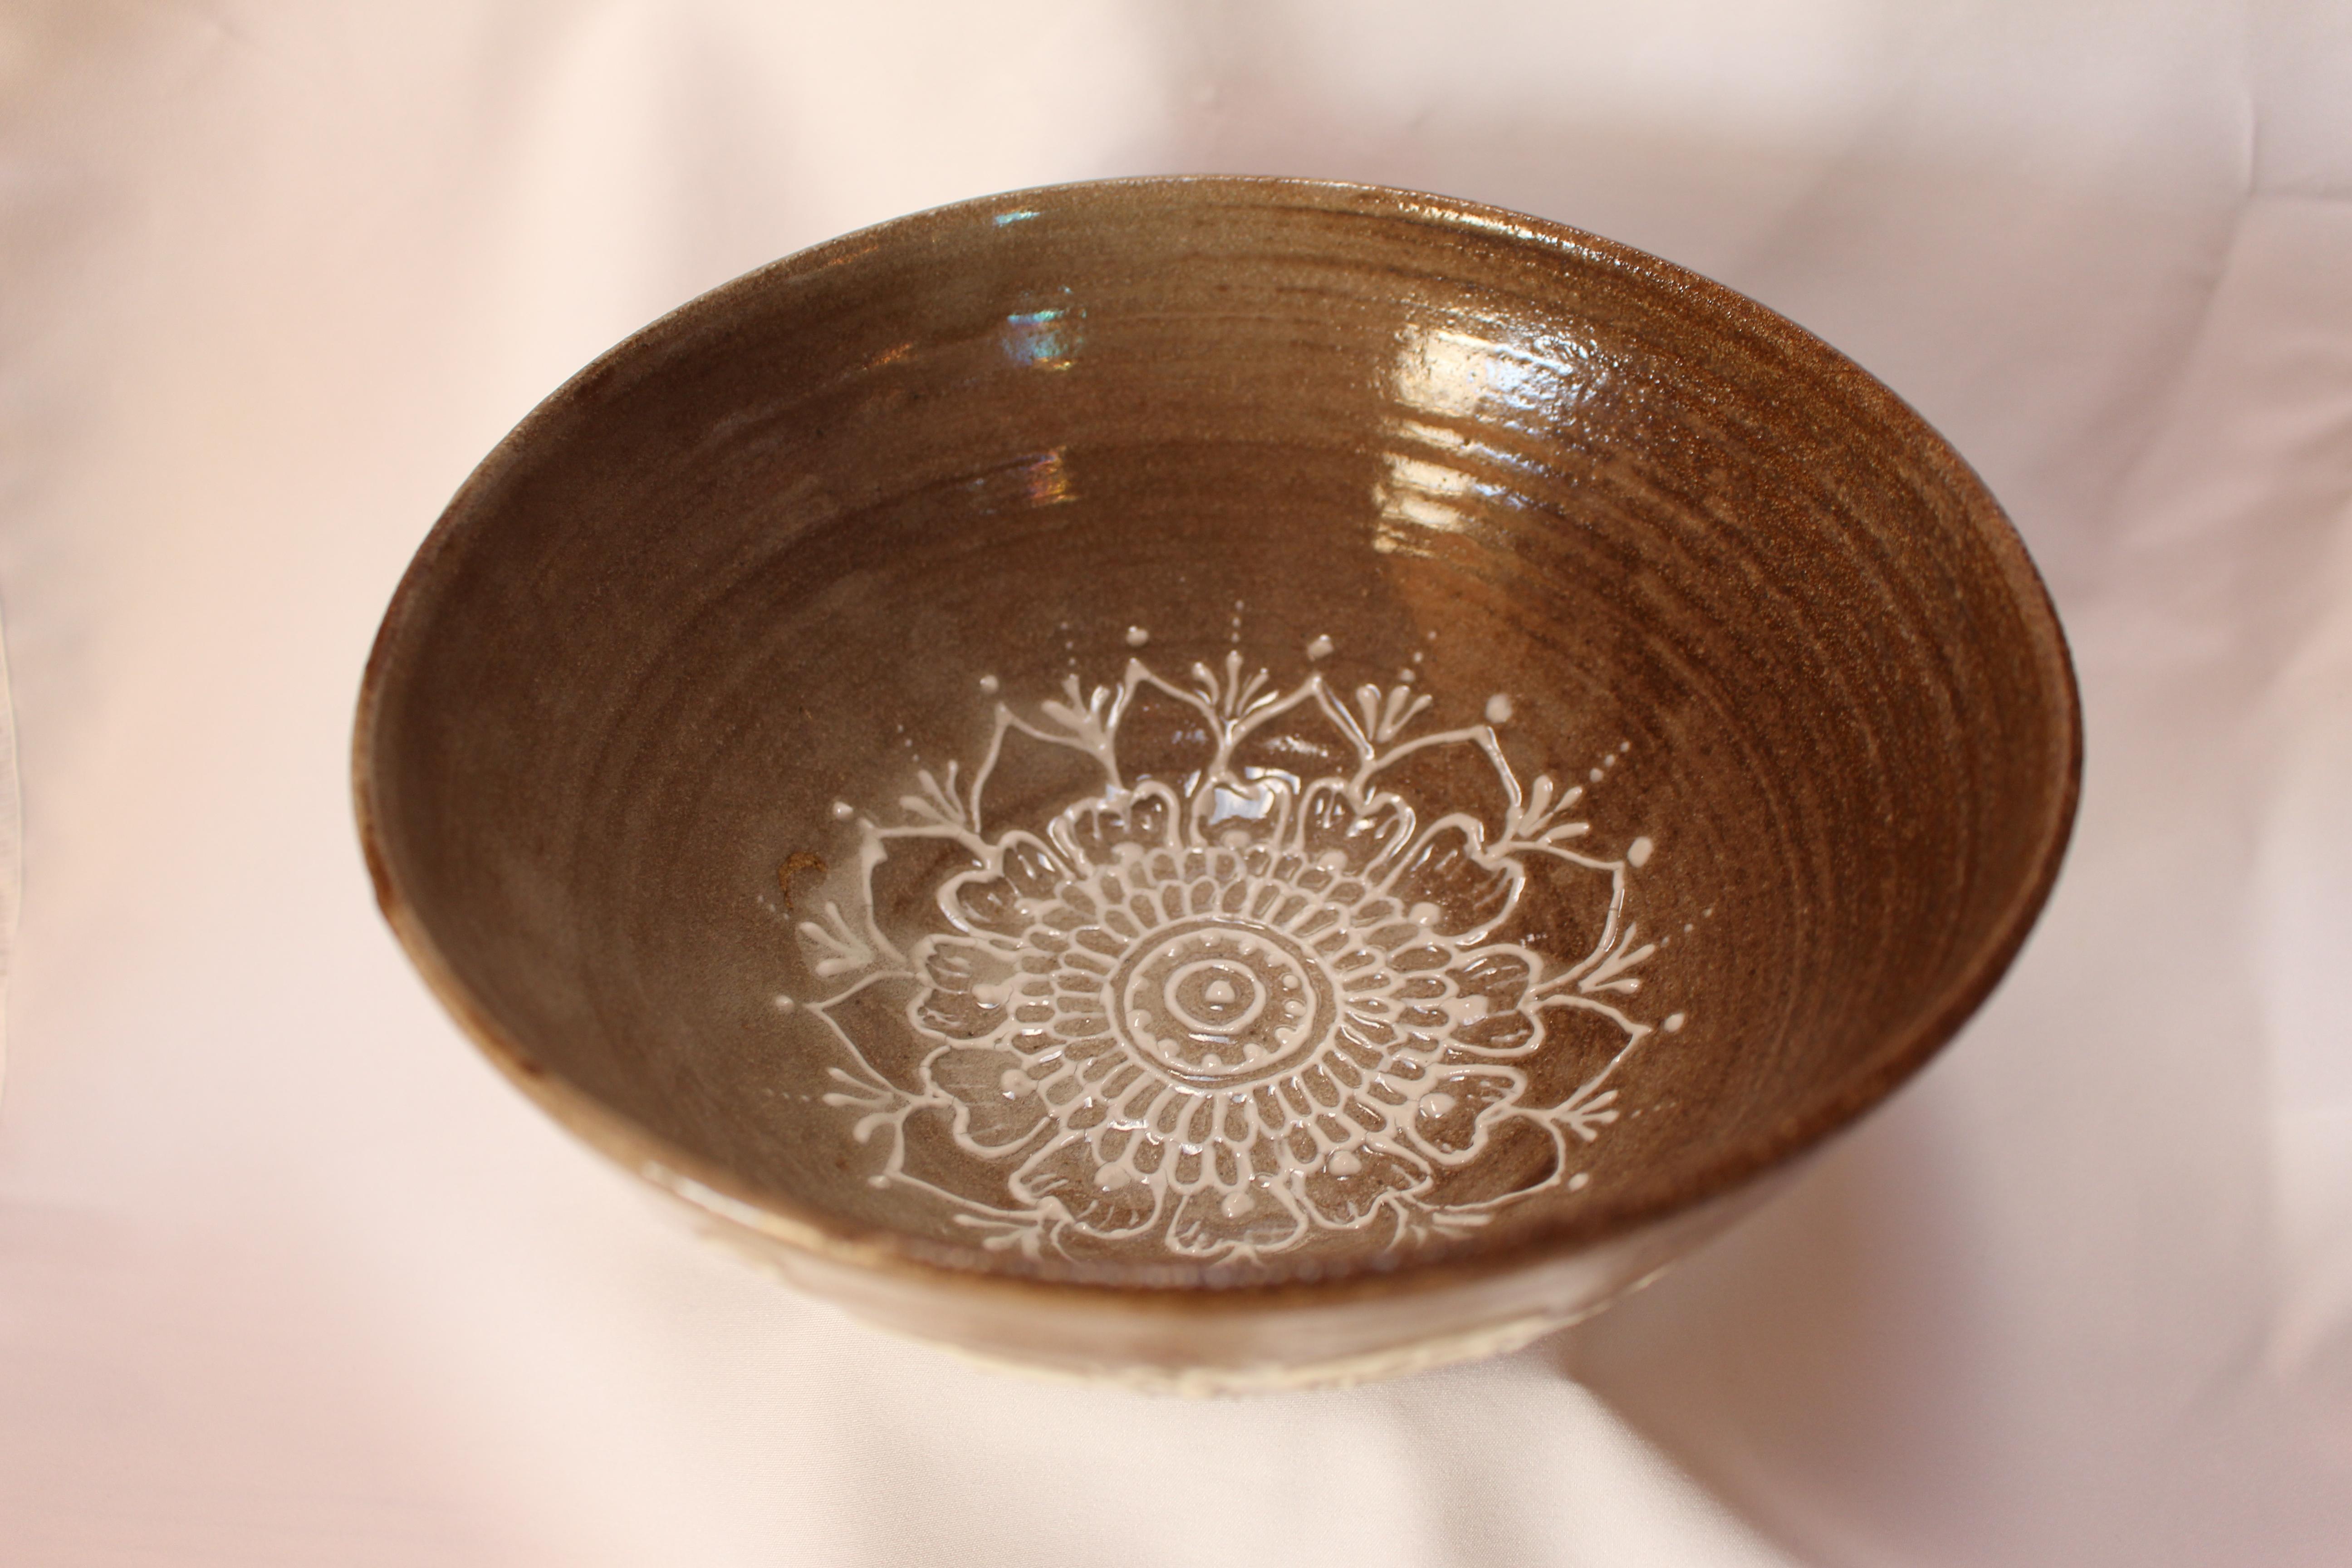 Henna Design Bowl